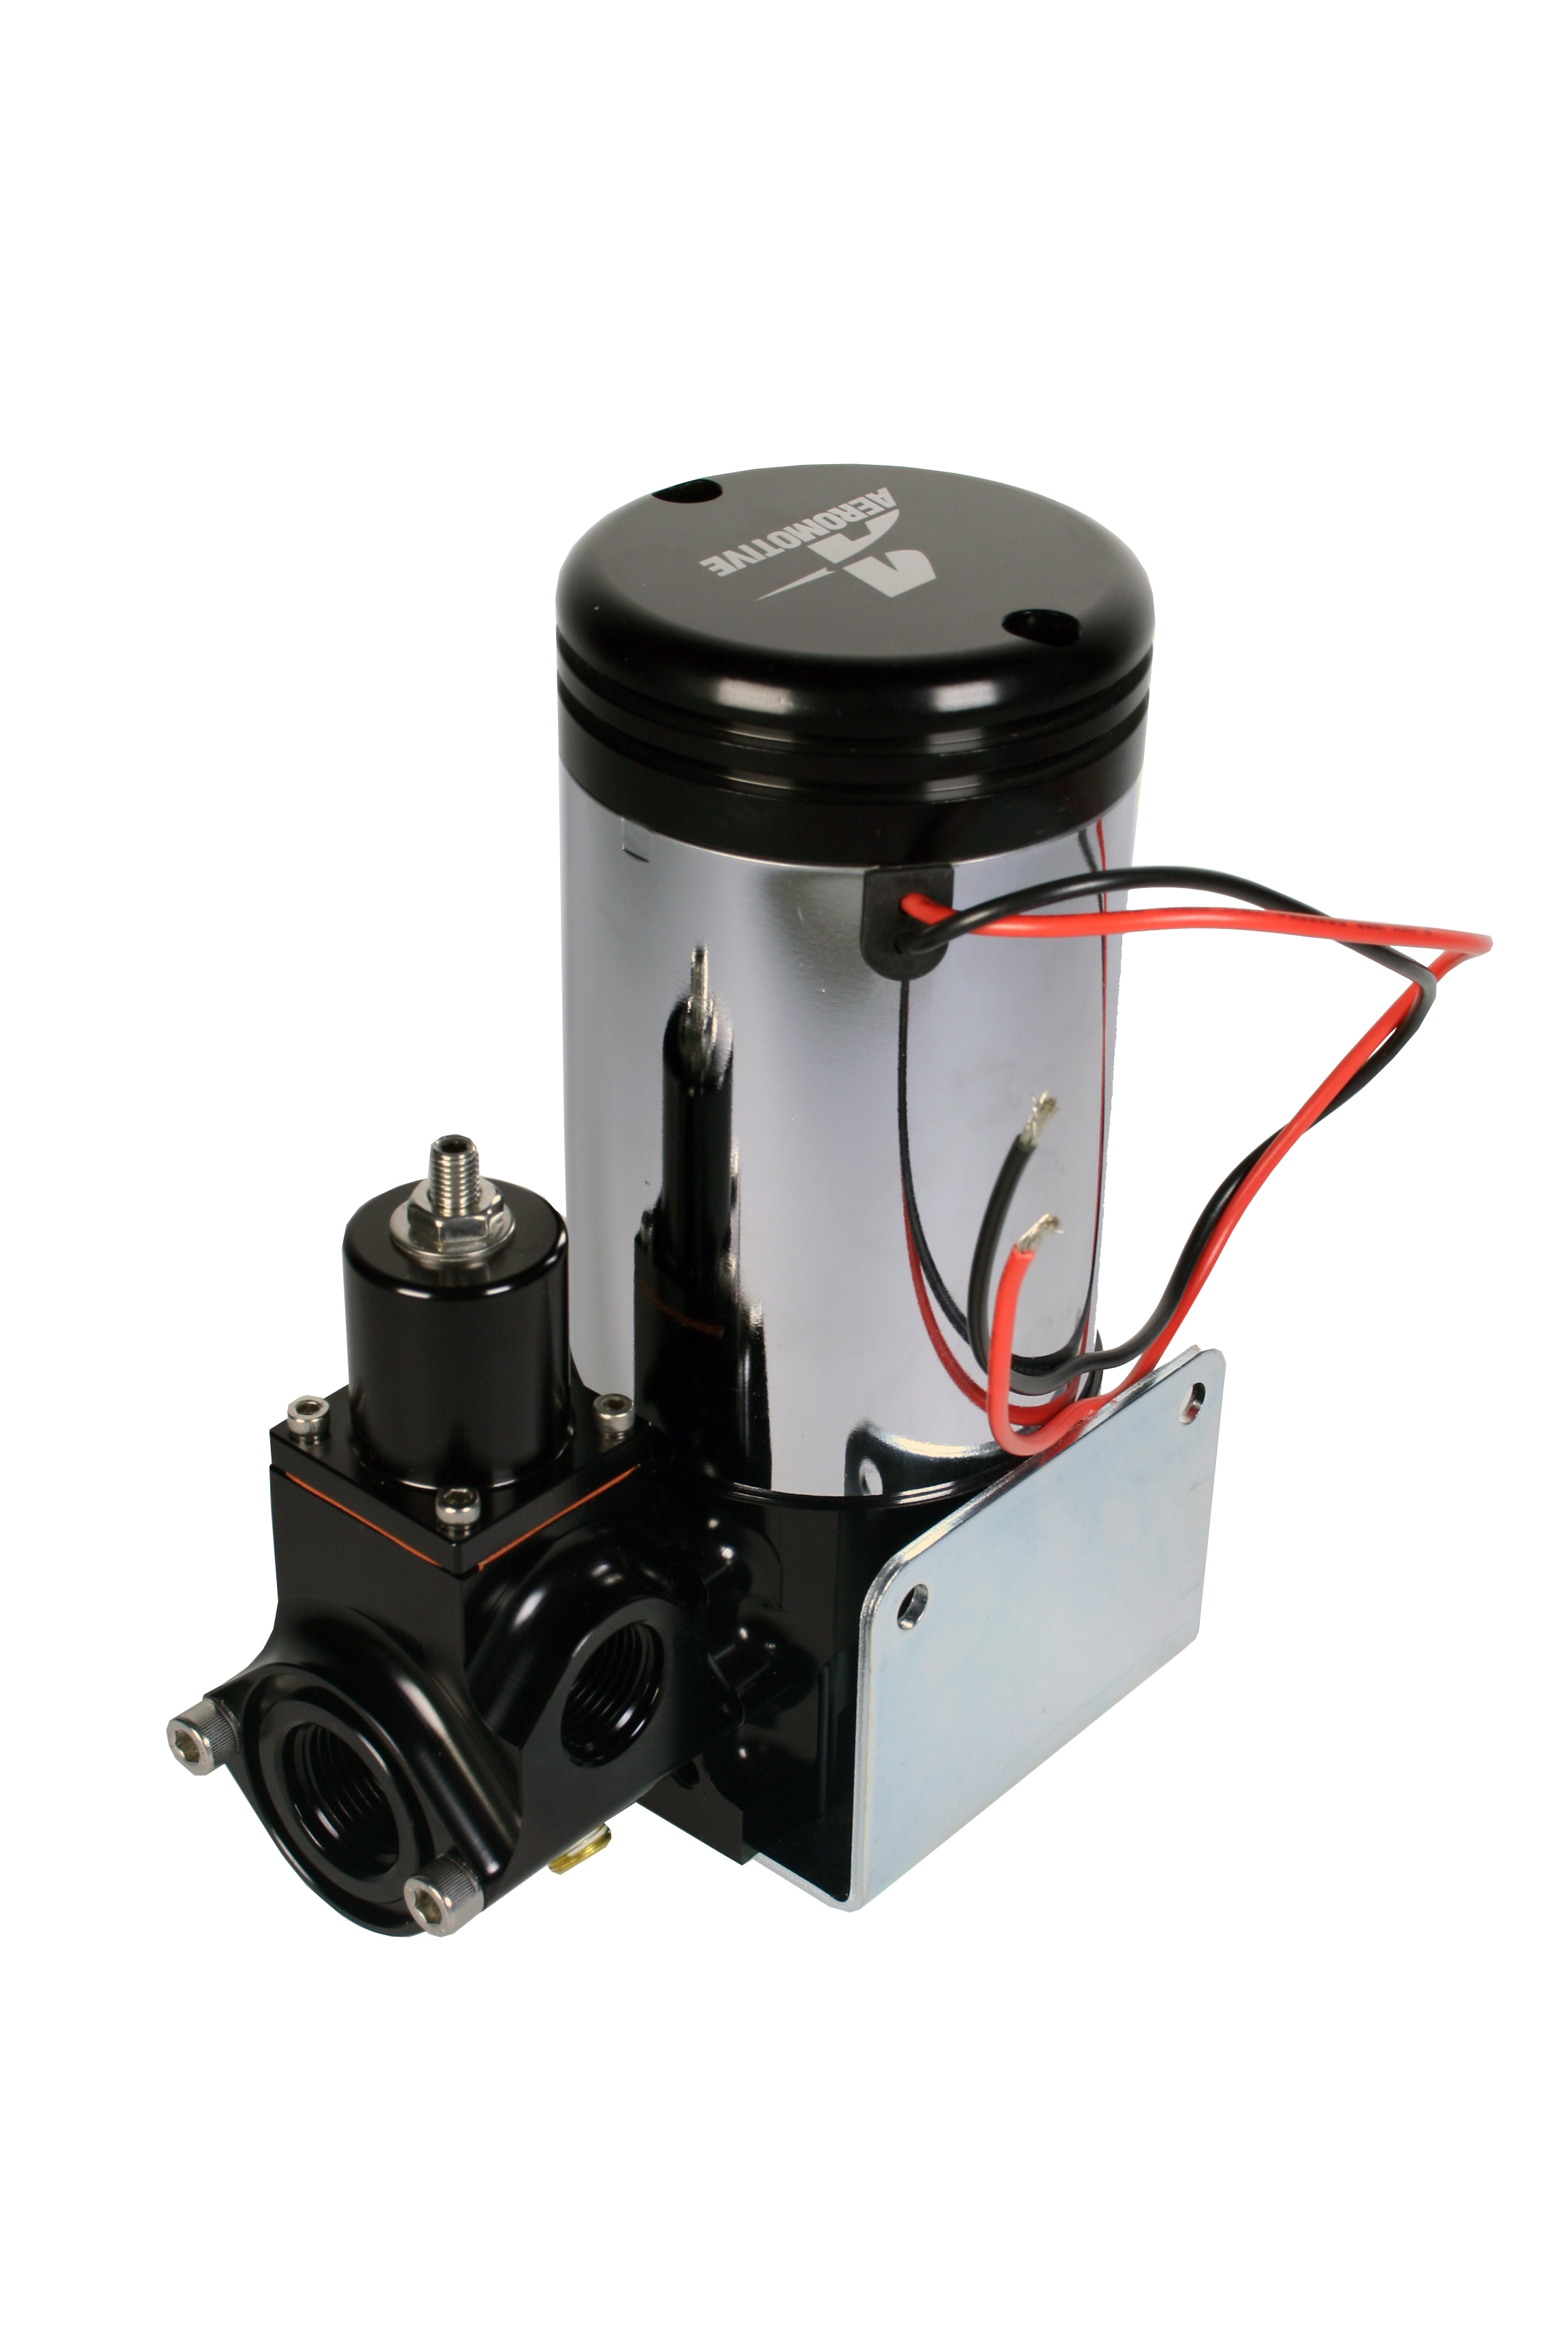 11202 Fuel Pump Electric External A2000 Drag Race Carbureted Fuel P